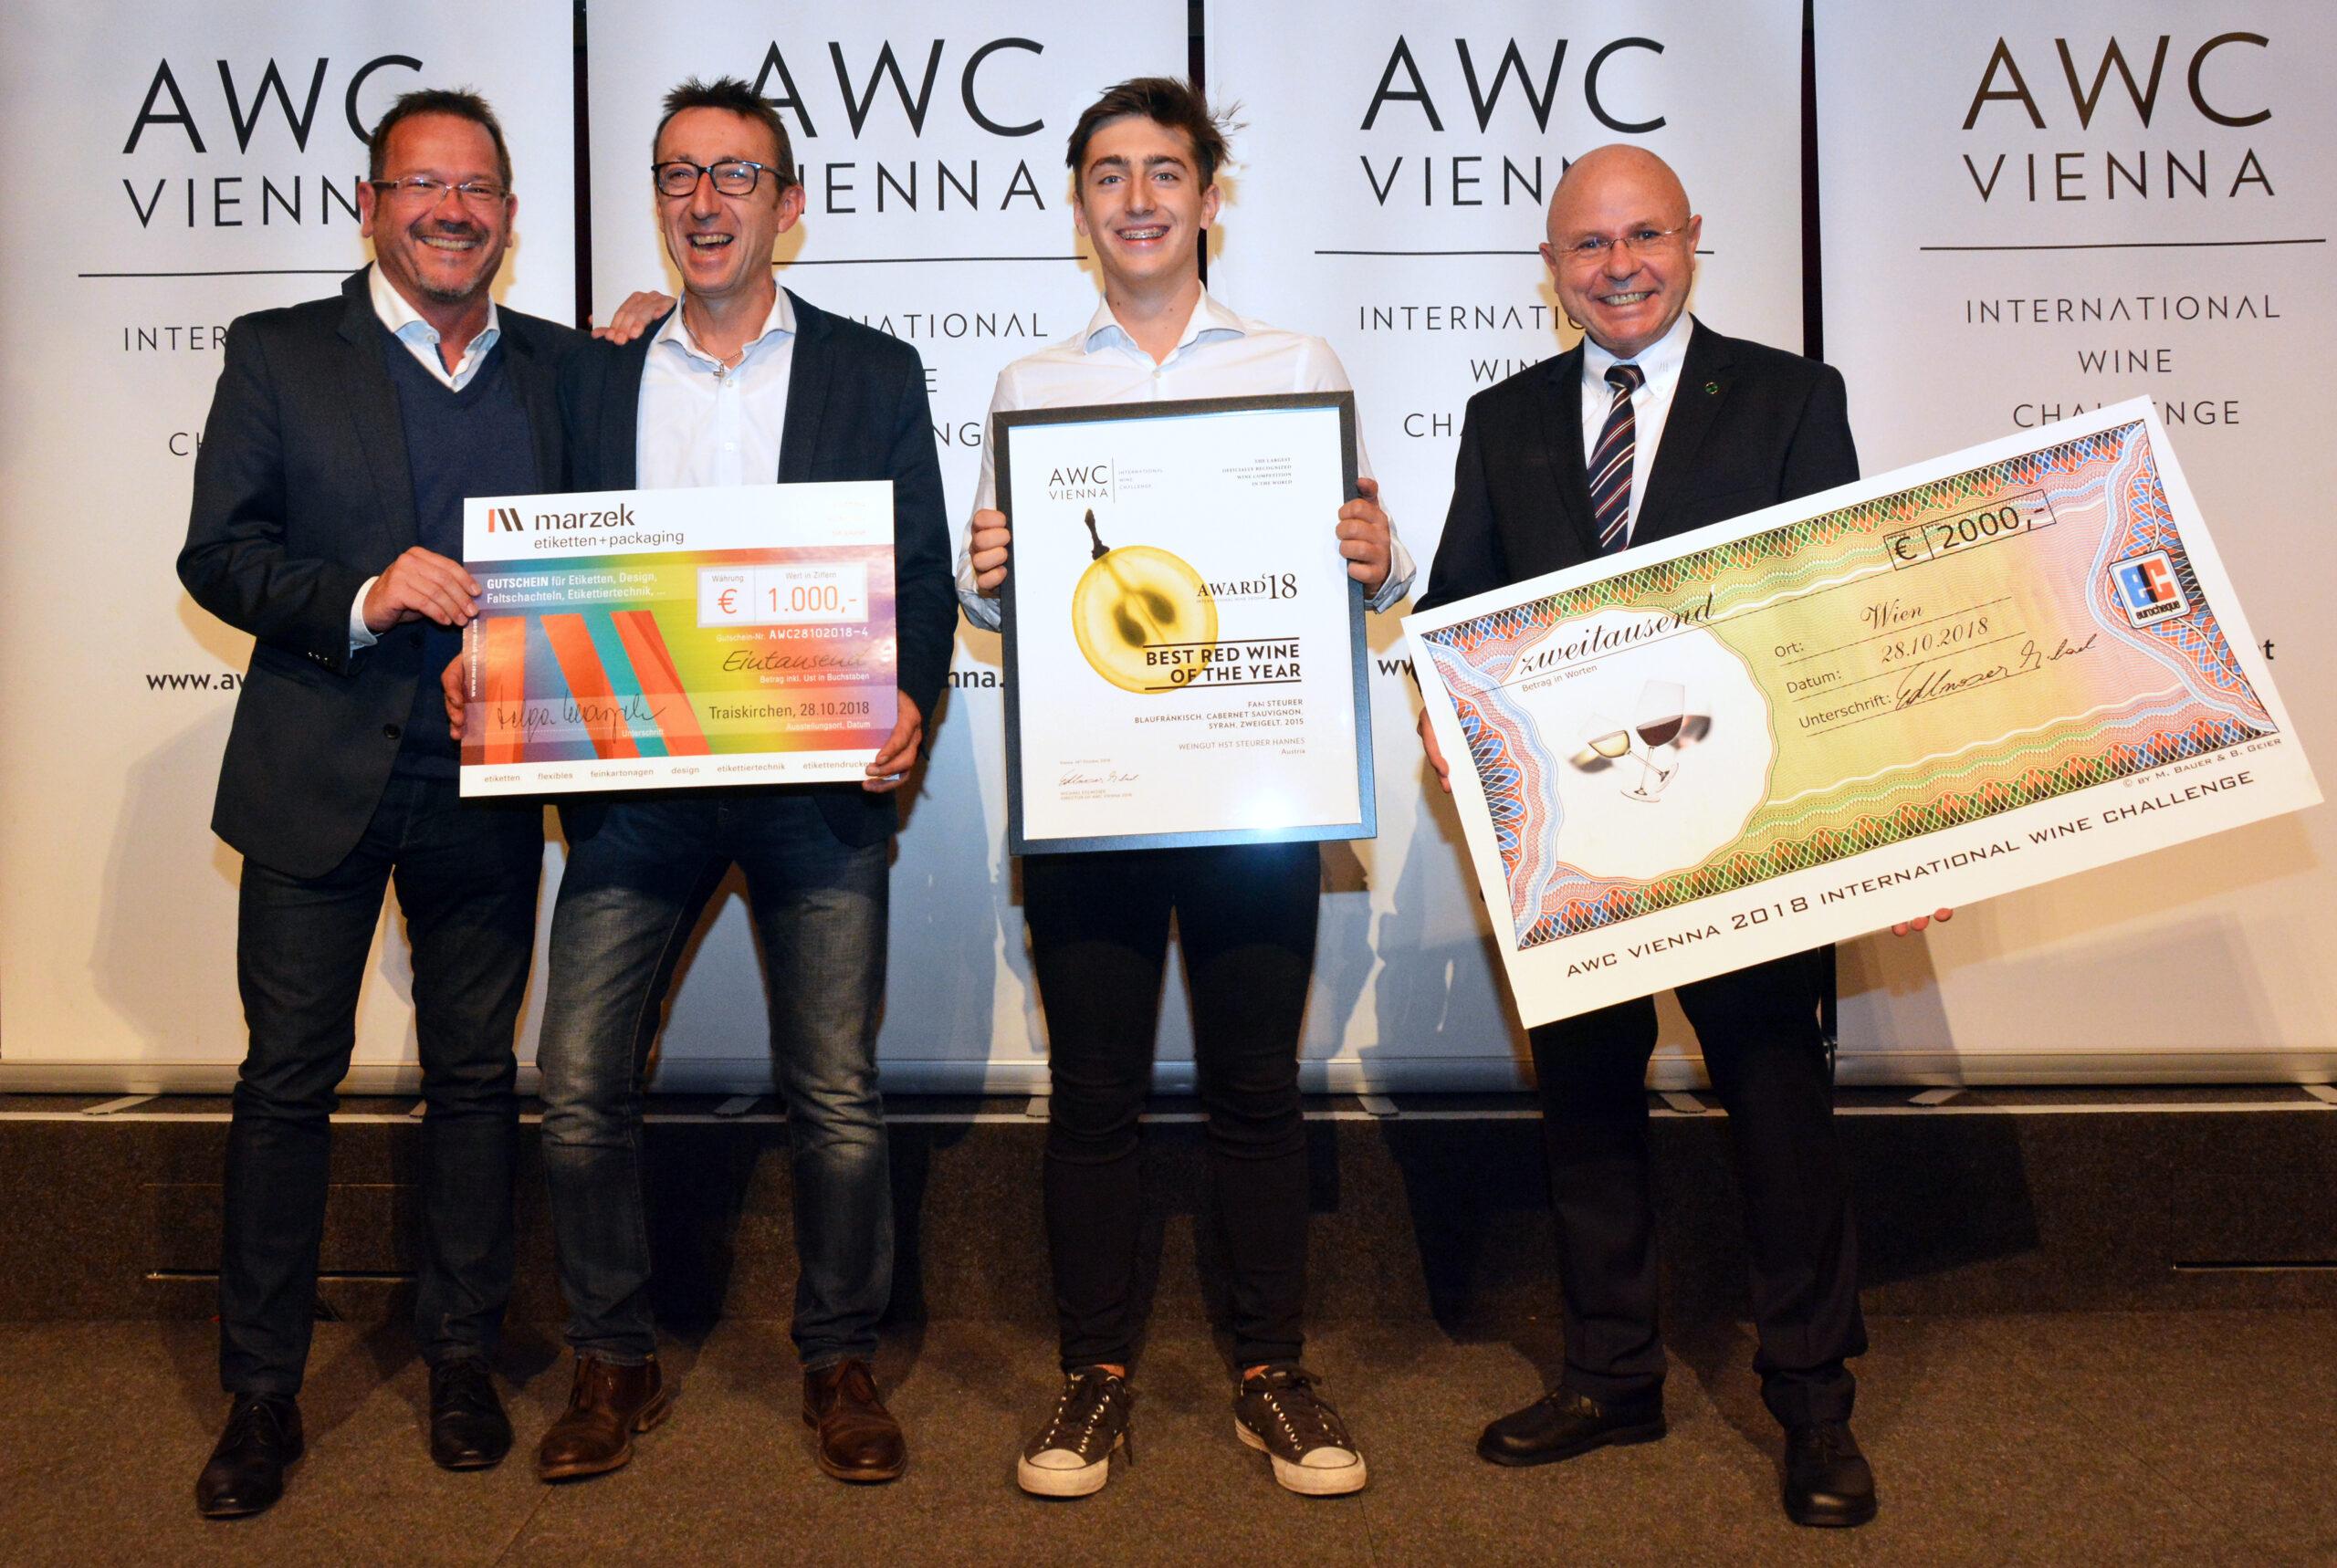 Weingut HST Hannes Steurer: Wir sind AWC Trophy-Sieger 2018 mit FAM STEURER, Foto: Maria Steurer-Haltschuster